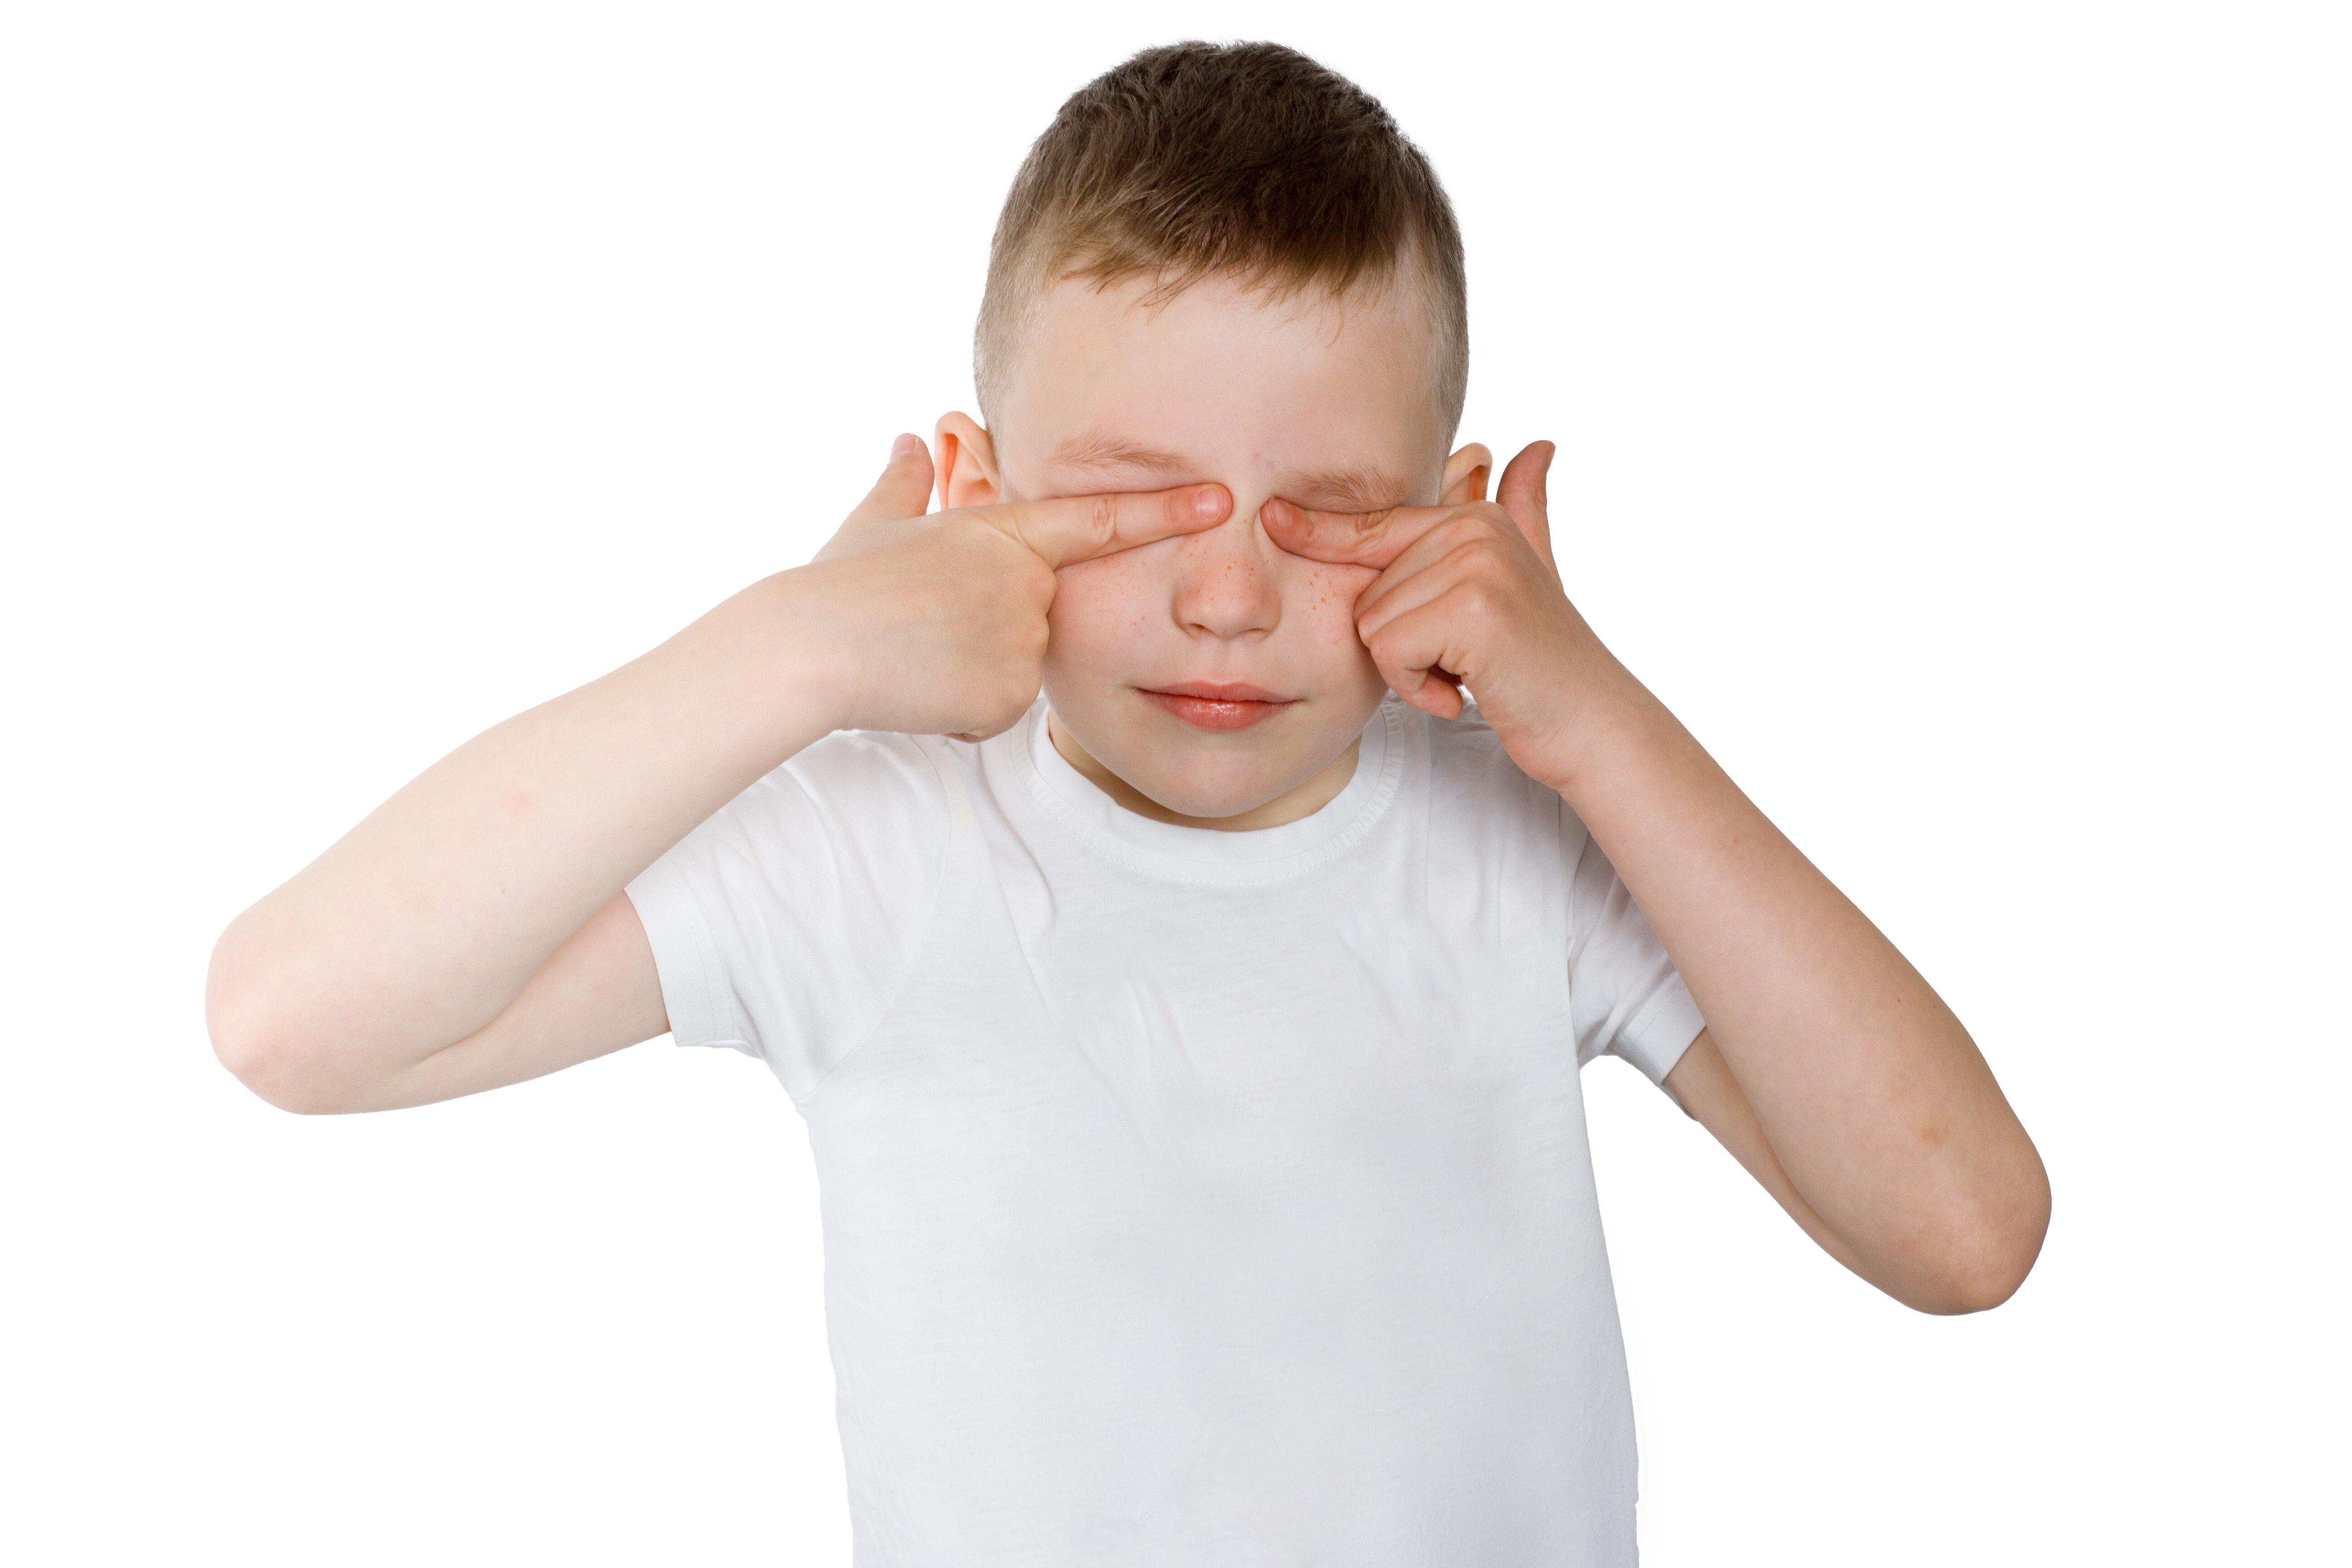 Boy rubs his eyes